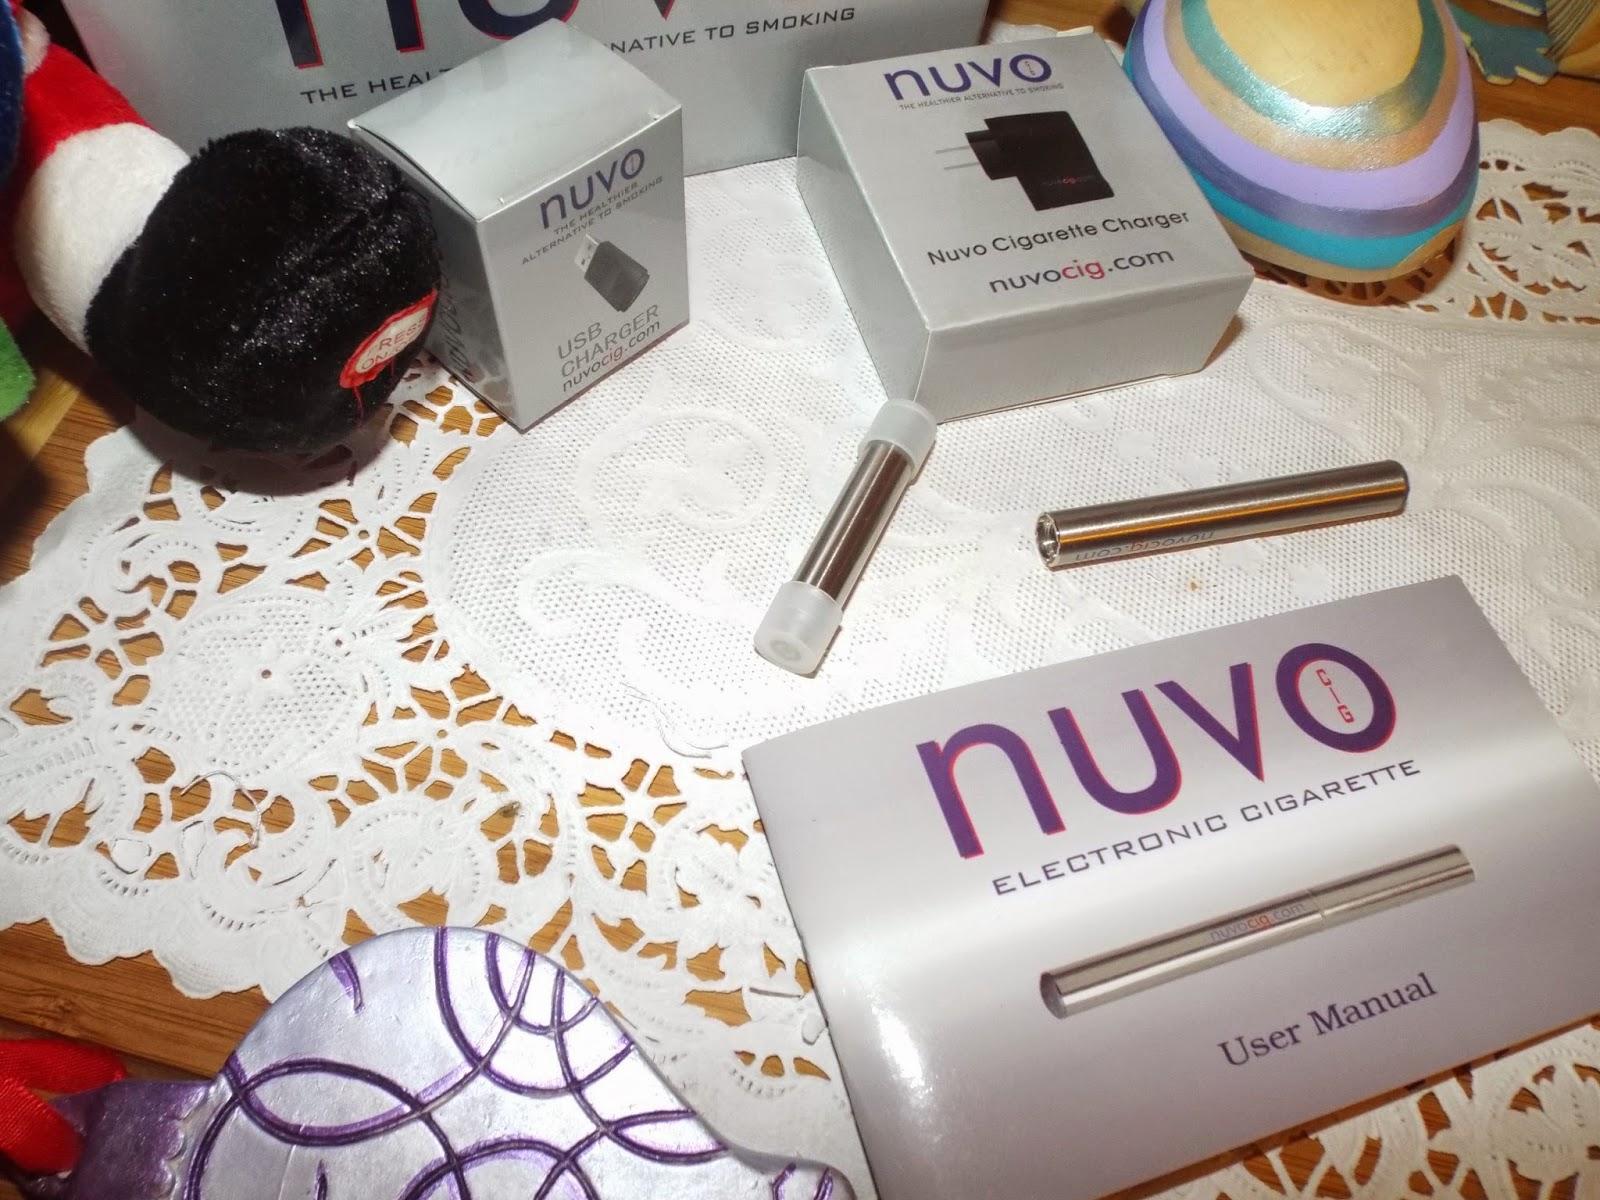 NuvoCig.Com Deluxe Kit